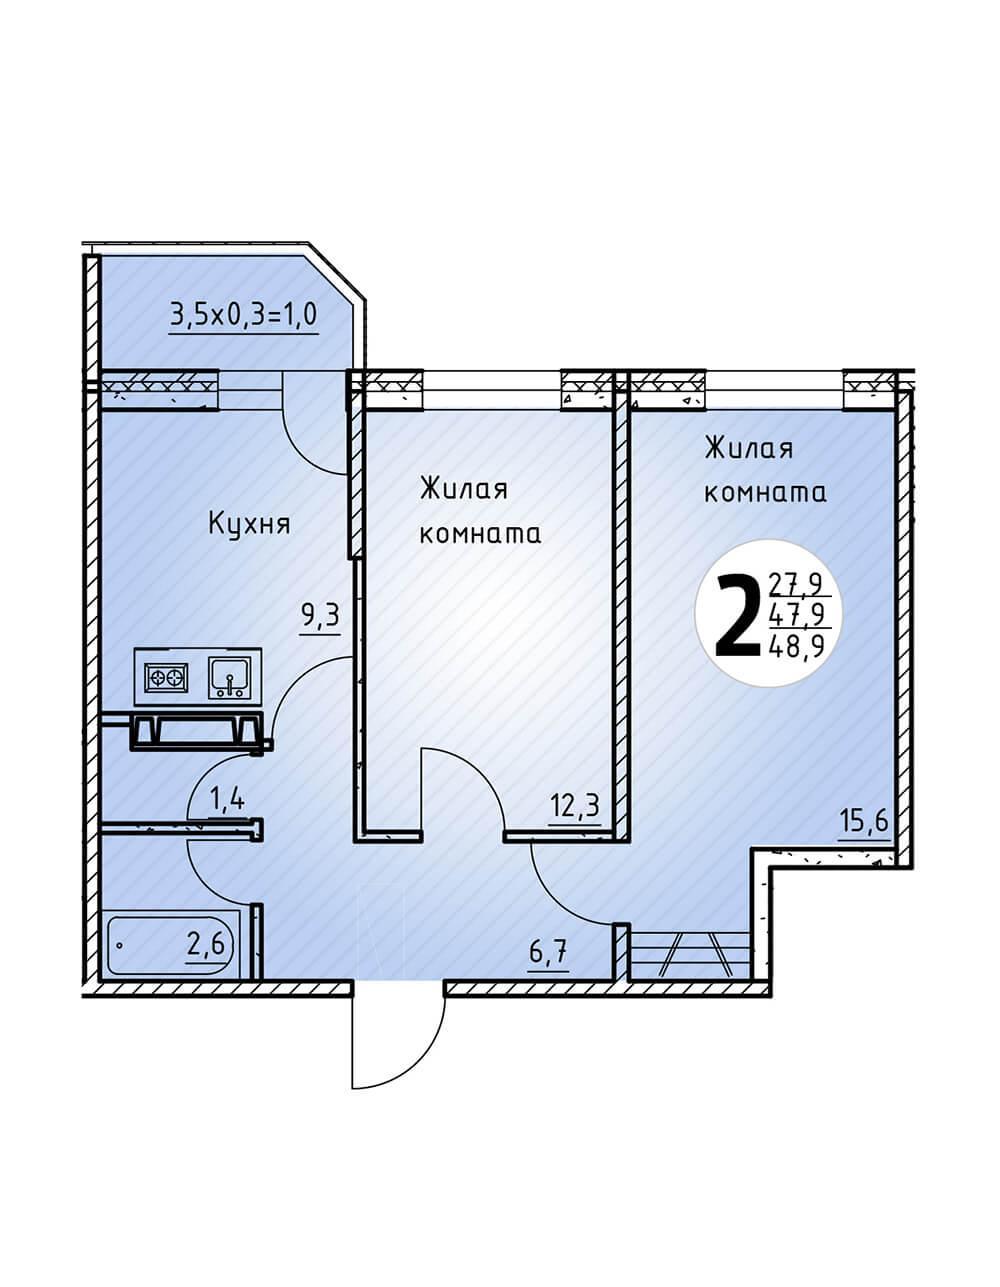 Двухкомнатная квартира 48,9 кв.м.